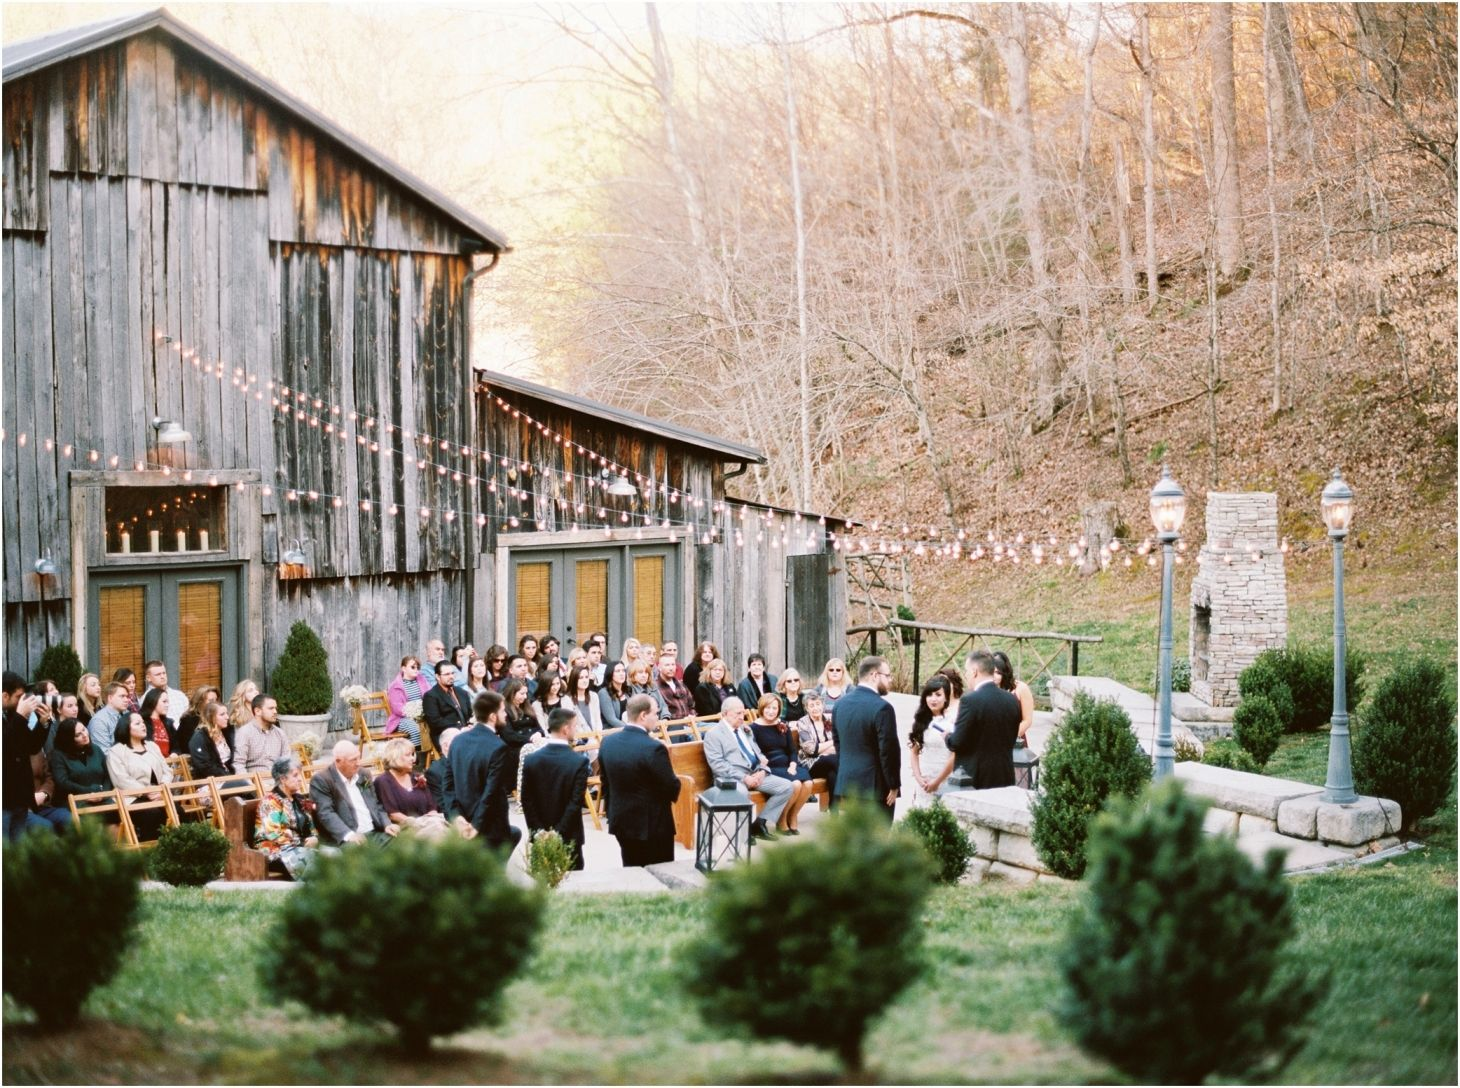 The Barn At Chestnut Springs Barn Wedding Venue Smoky Mountain